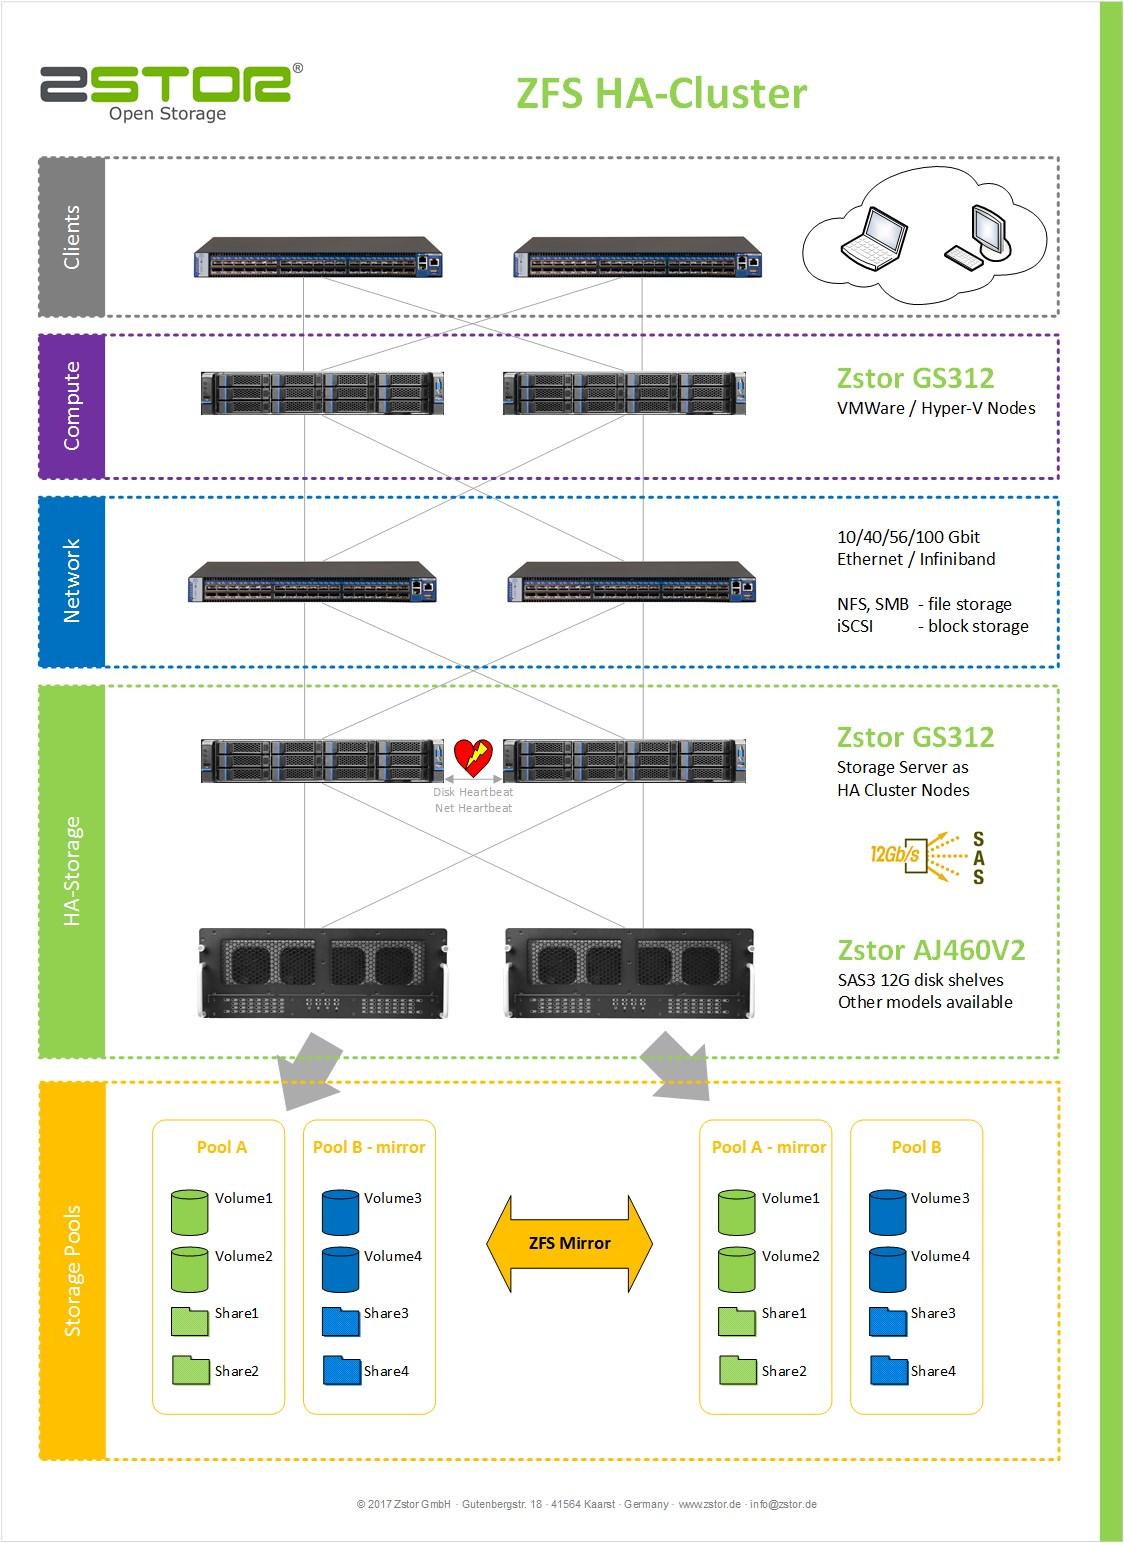 Napp-it ZFS Web-Appliance | Produkte-Zstor GmbH - Open Storage